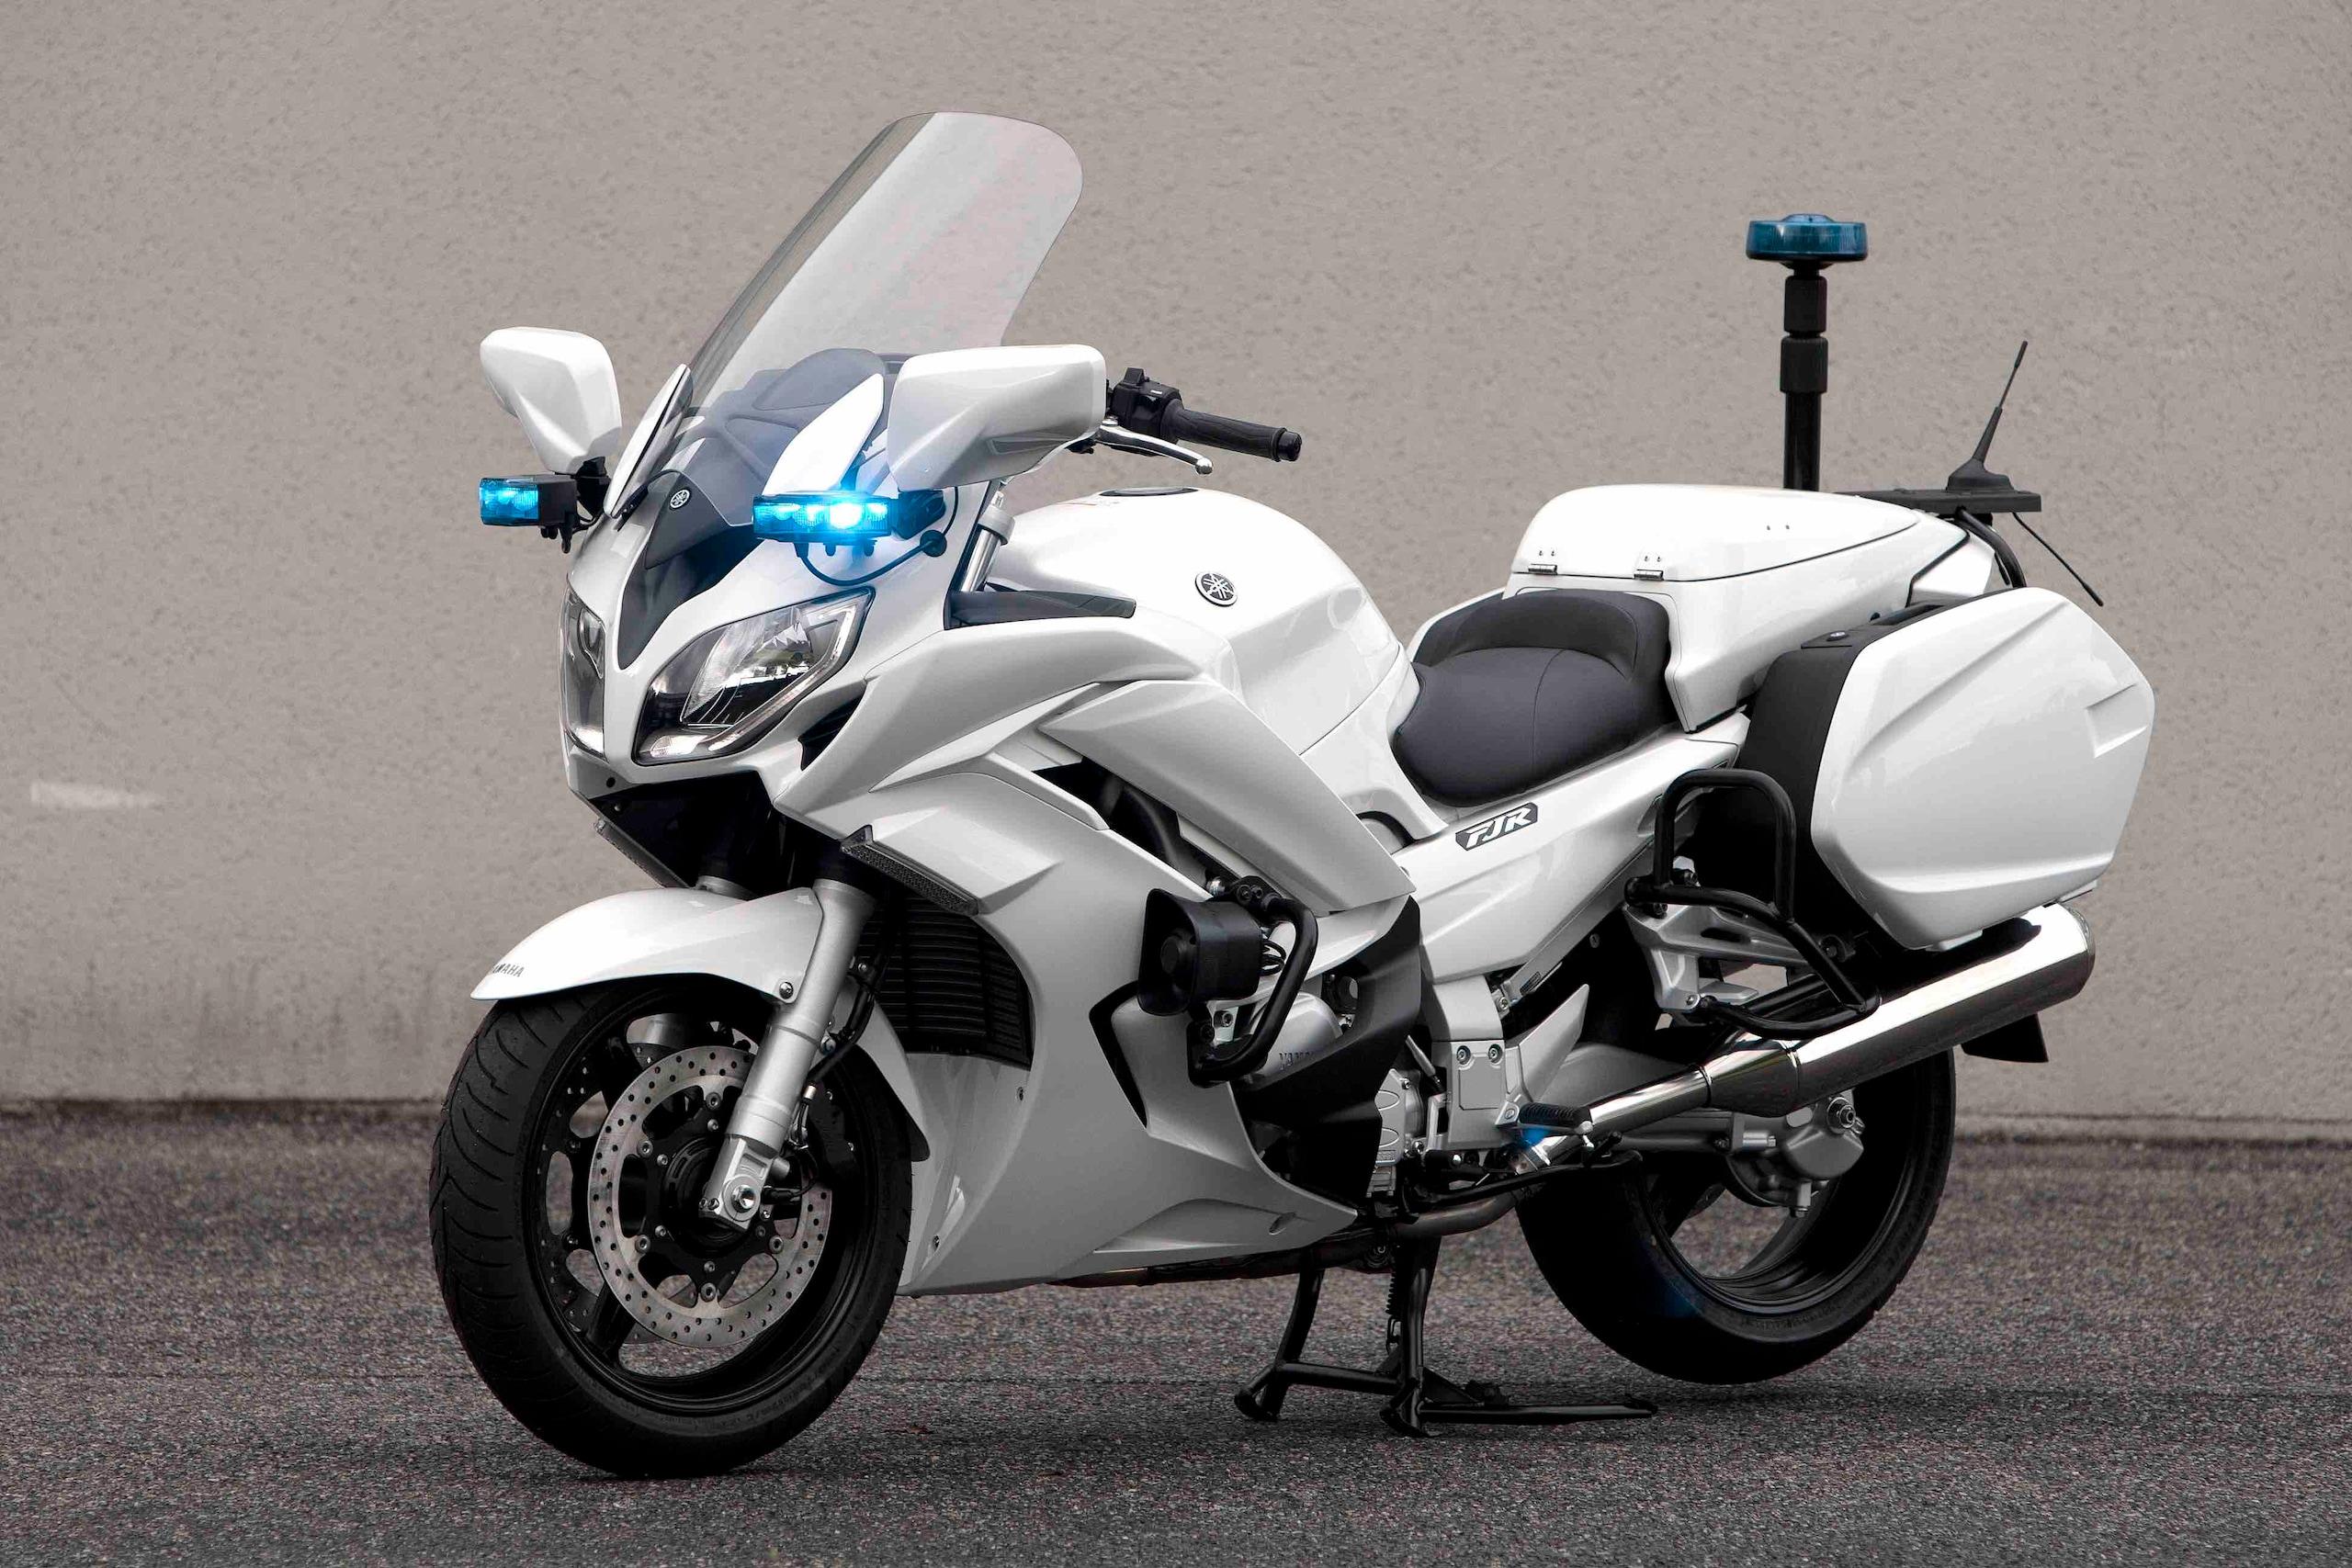 Yamaha presenta le moto in &ldquo;divisa&rdquo;<br />